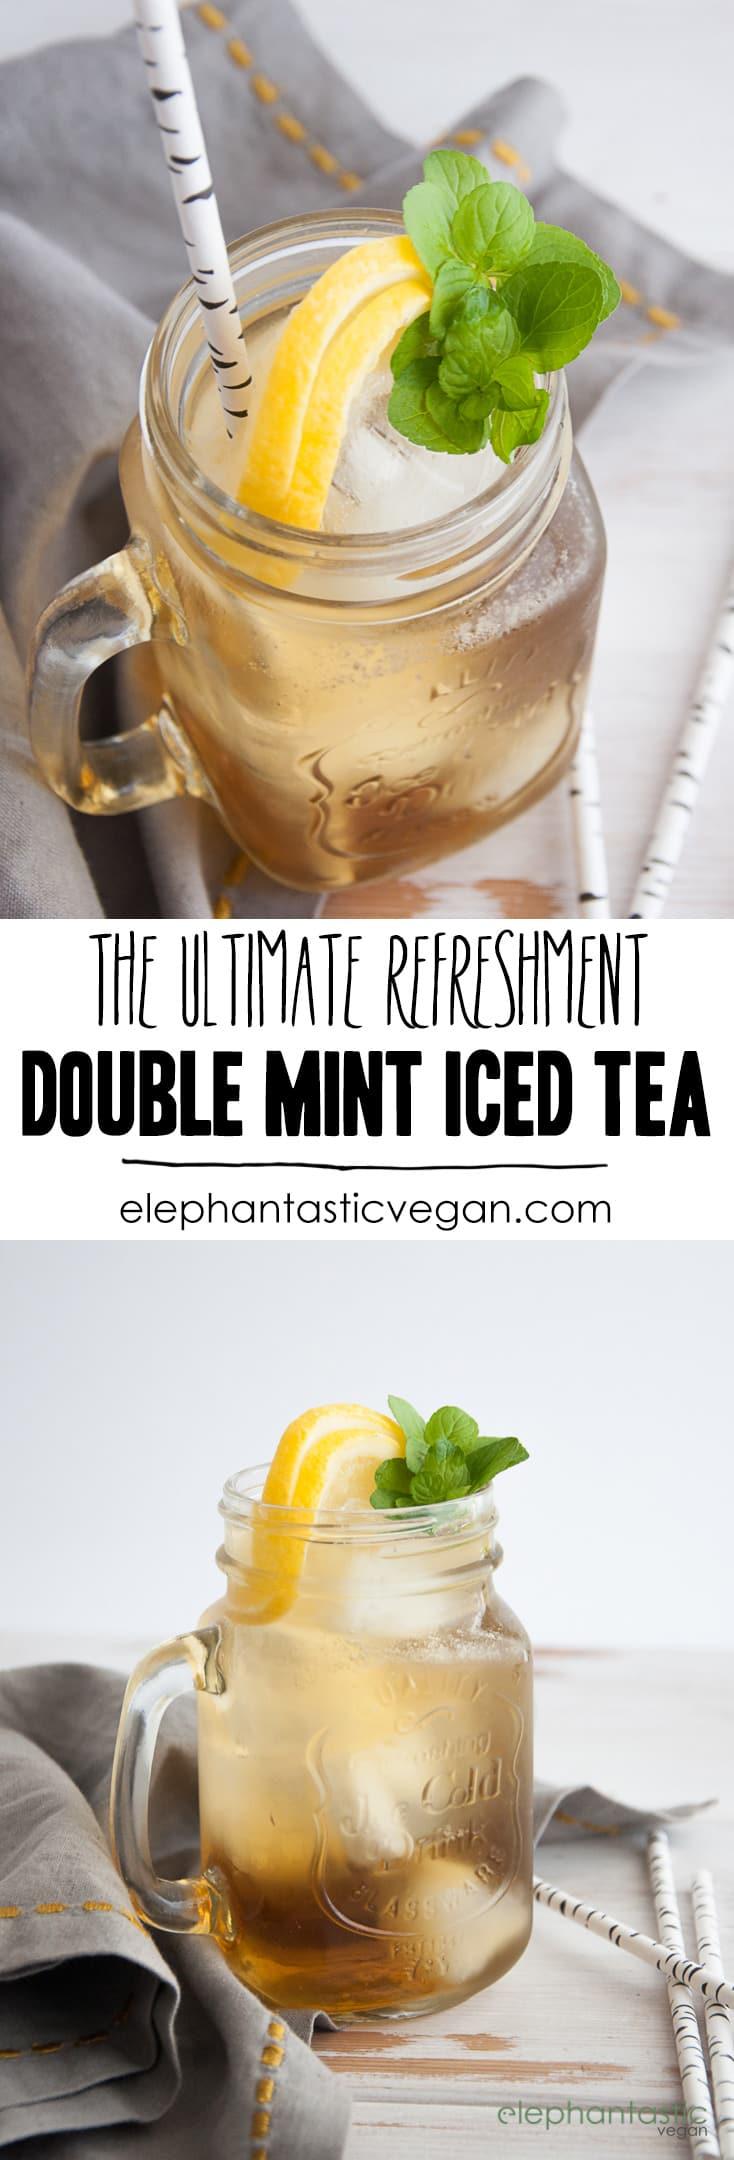 Double Mint Iced Tea | ElephantasticVegan.com